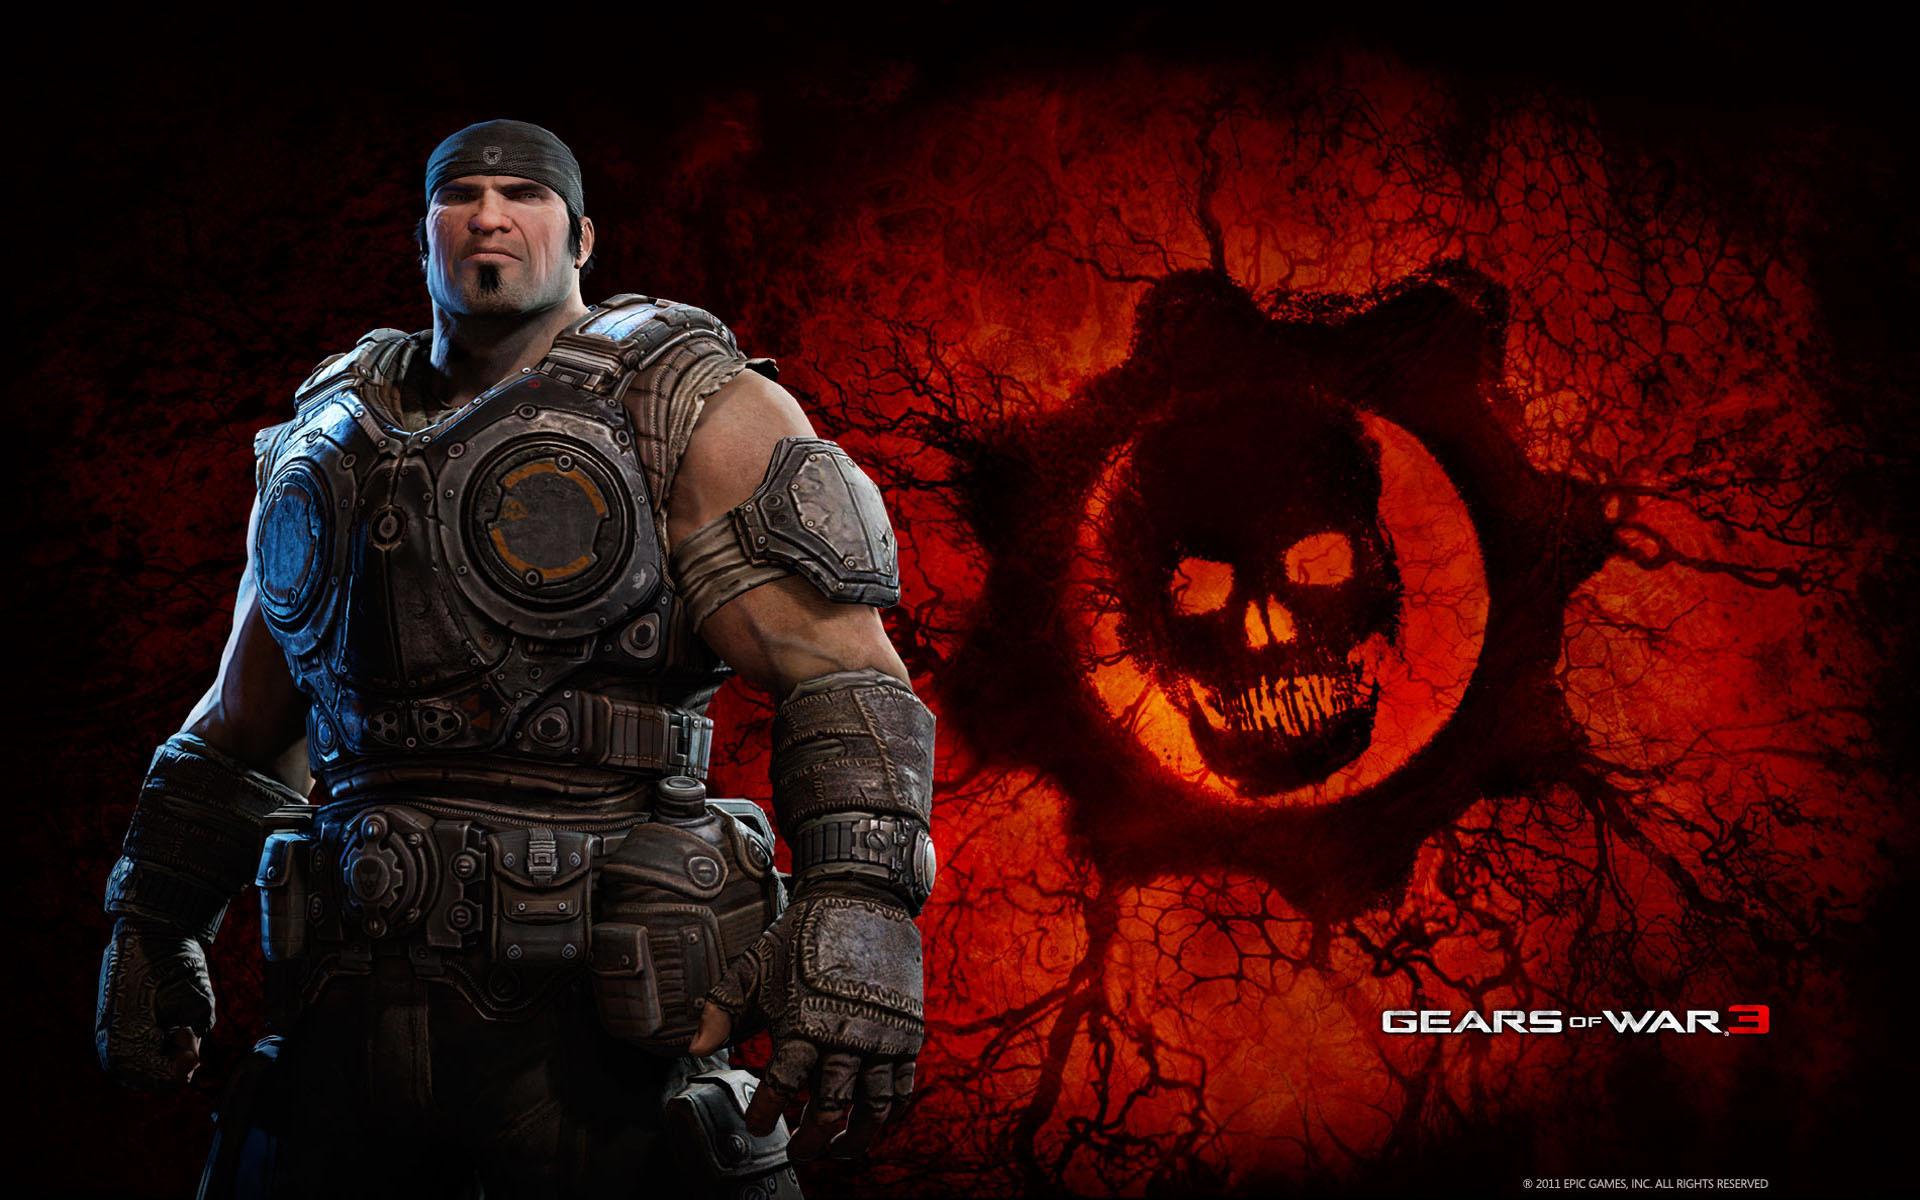 Marcus In Gears Of War 3 Wallpapers Wallpapers Hd